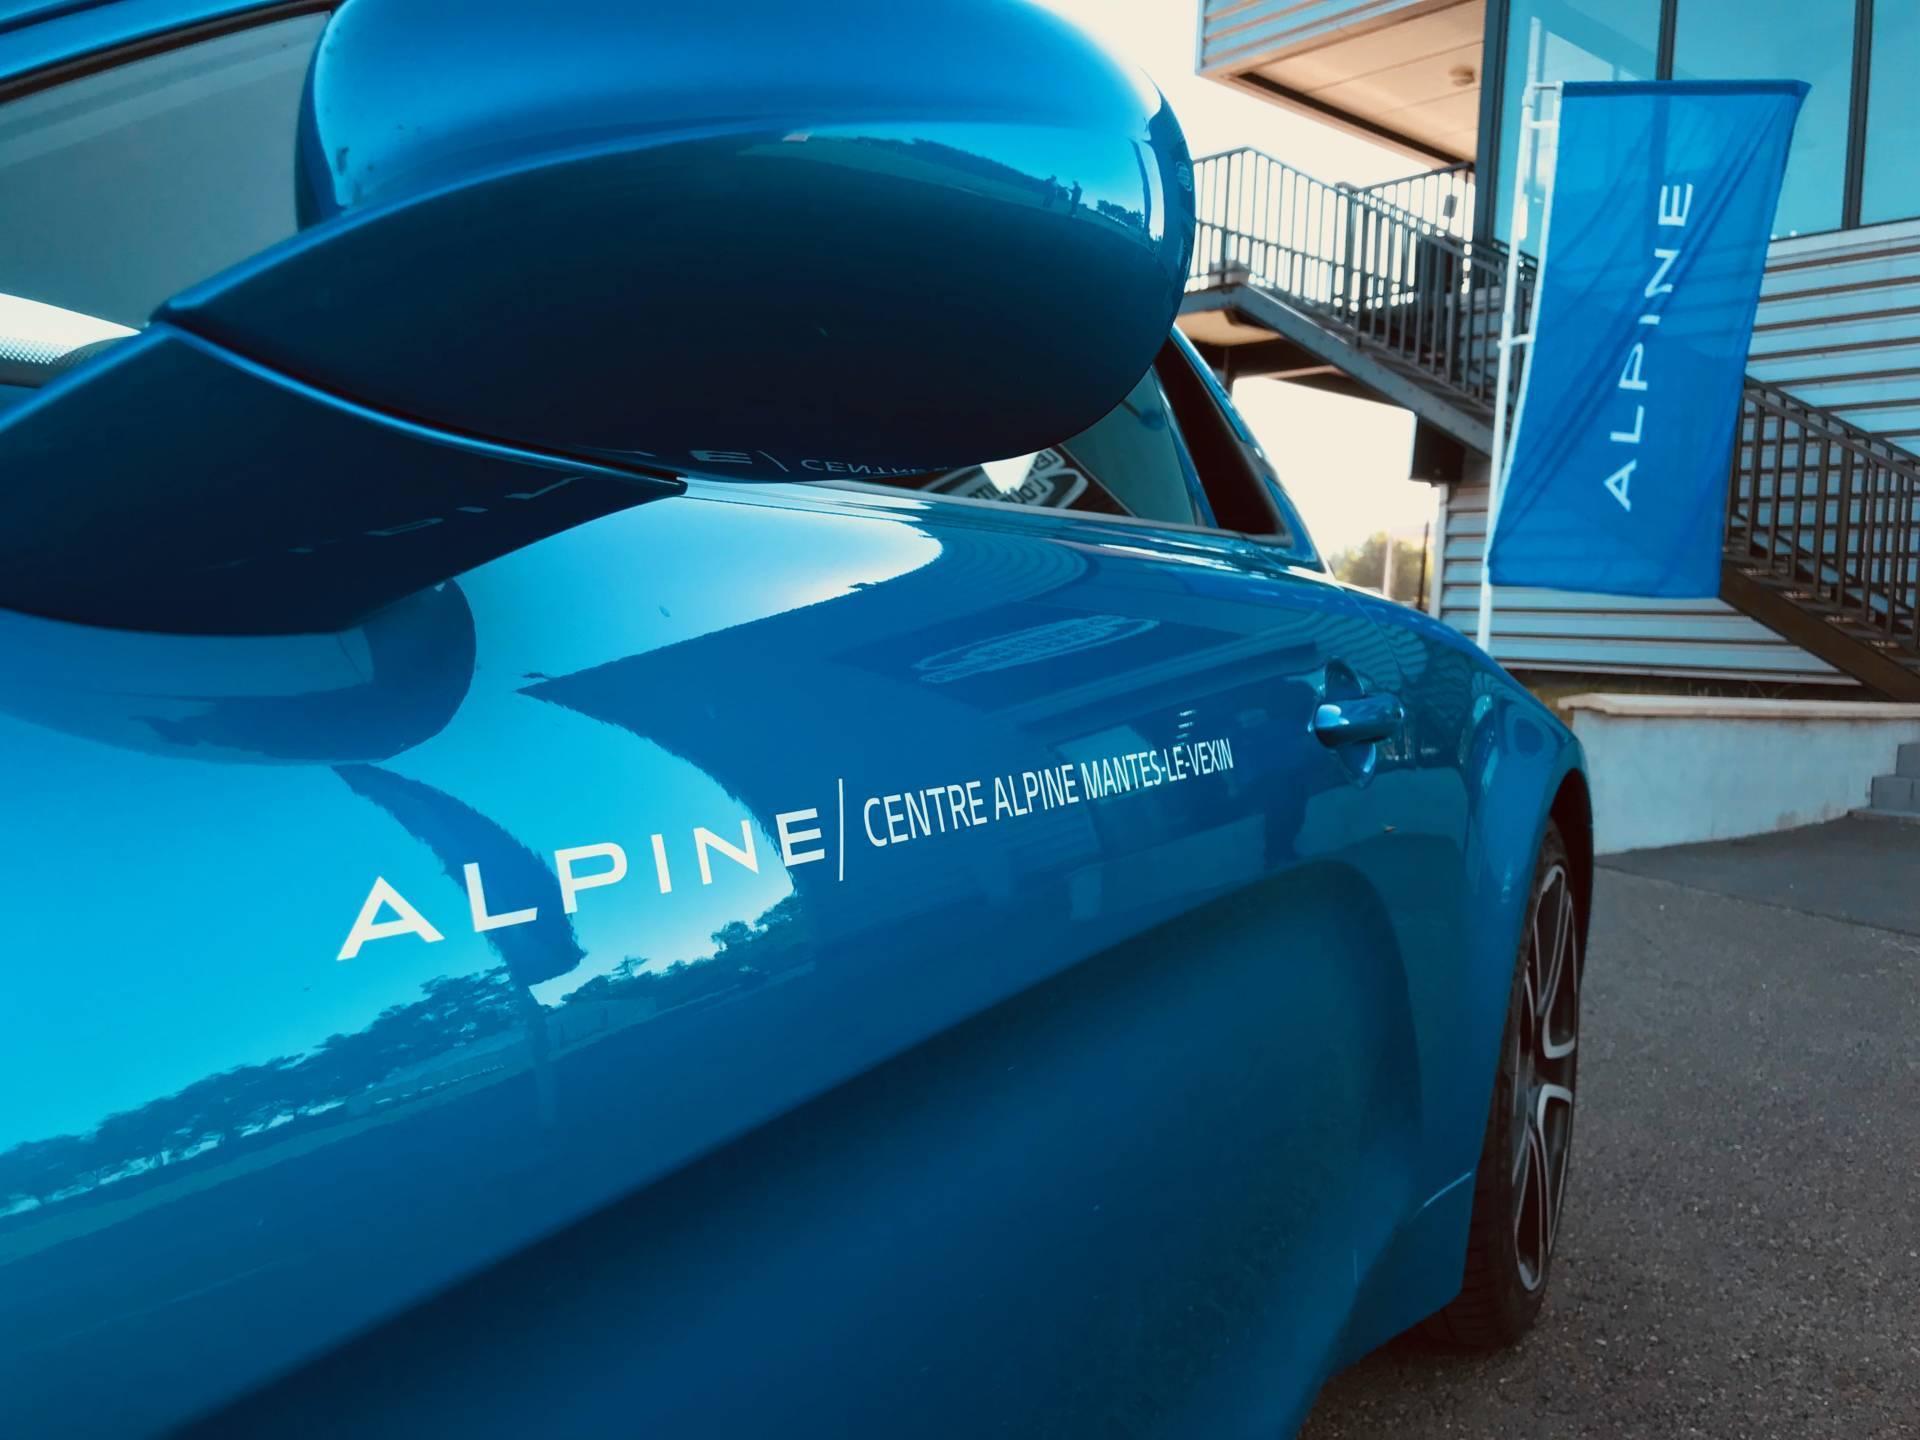 IMG 7626 1   Centre Alpine Mantes le Vexin